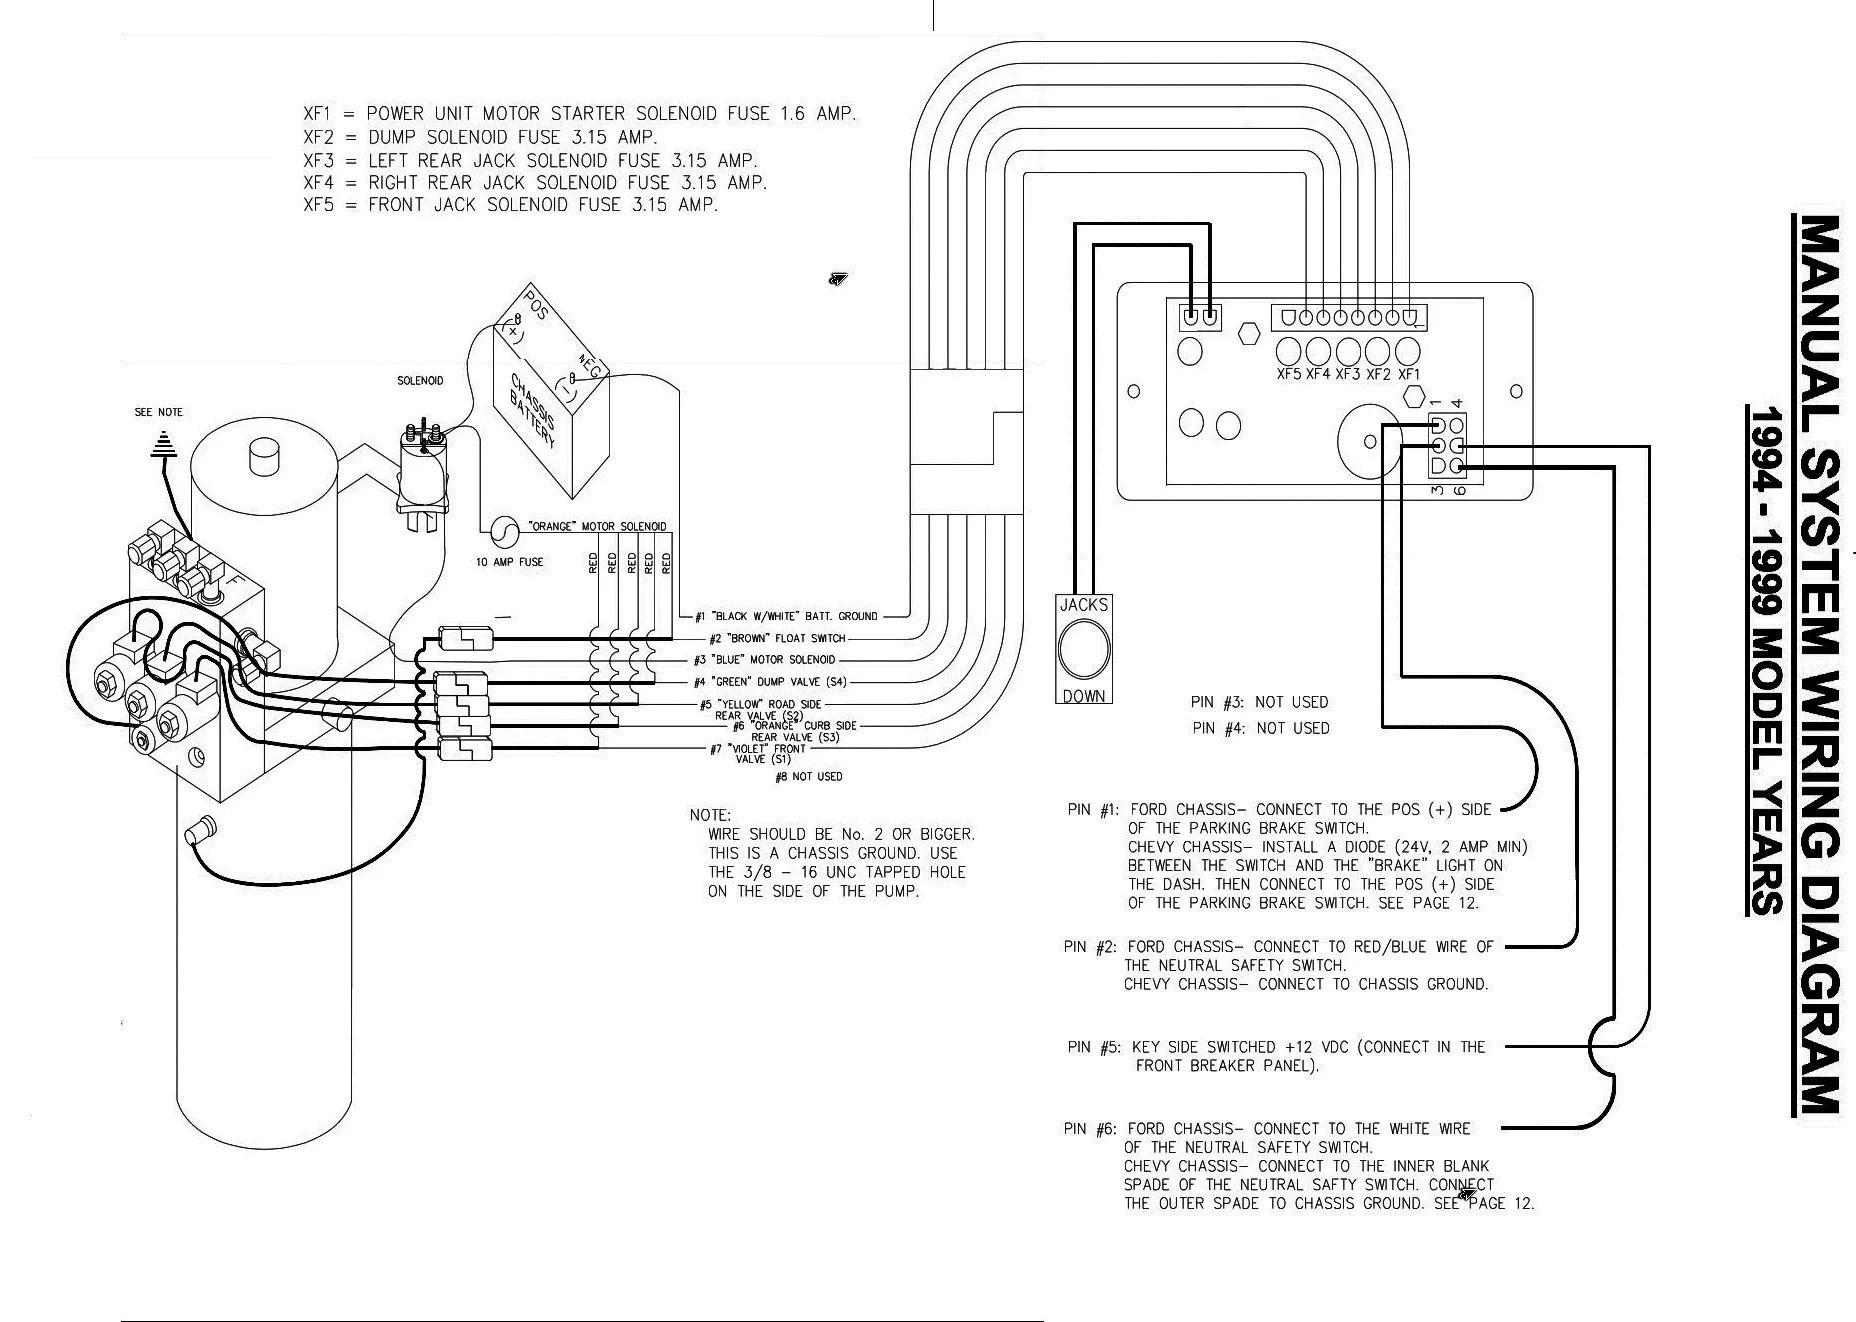 hight resolution of coachmen rv wiring diagrams wiring diagram forward coachmen rv wiring diagrams coachmen rv wiring diagram